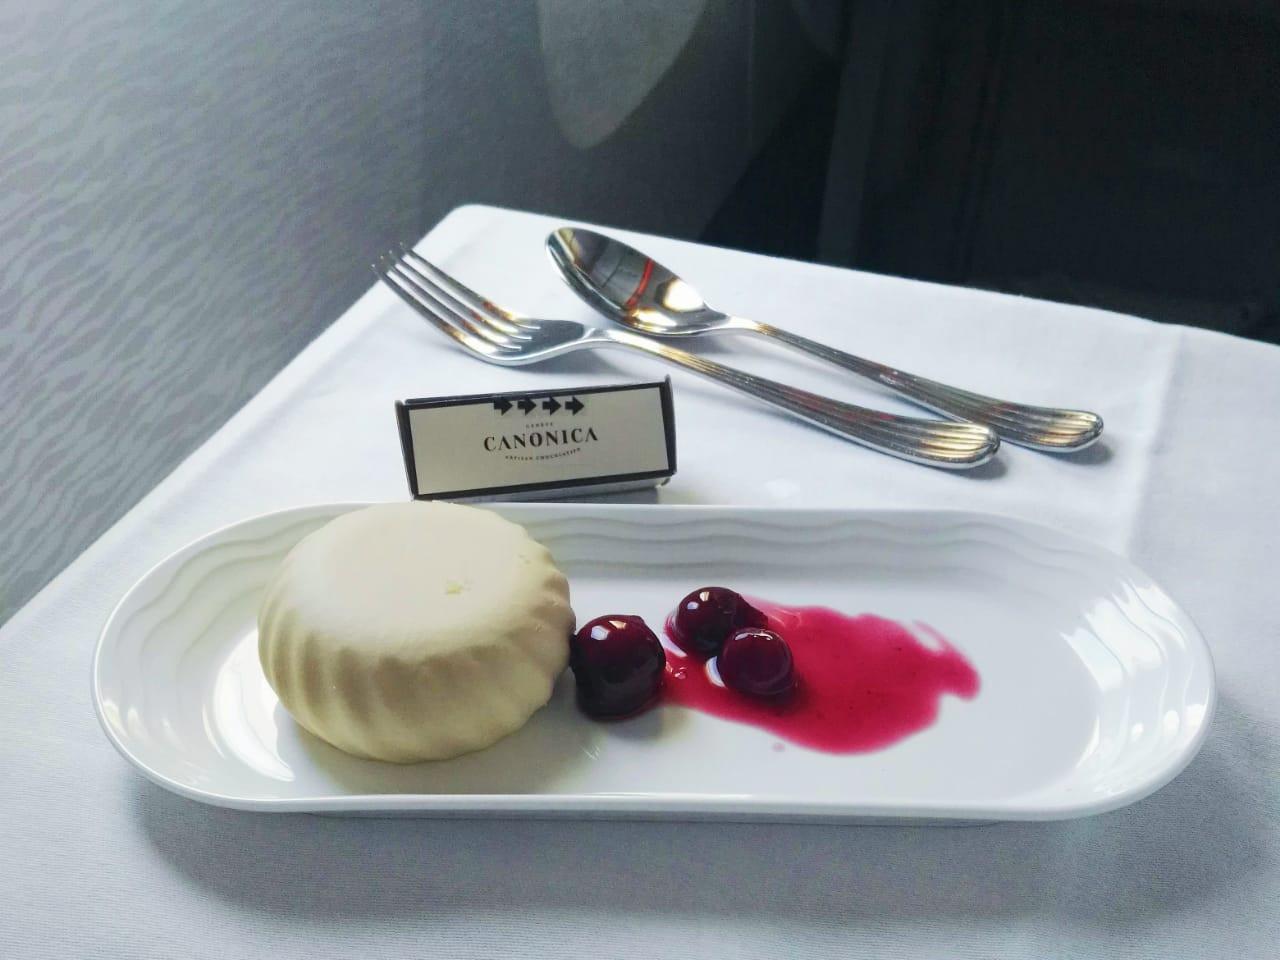 Dessert aboard EK451 Auckland-Denpasar